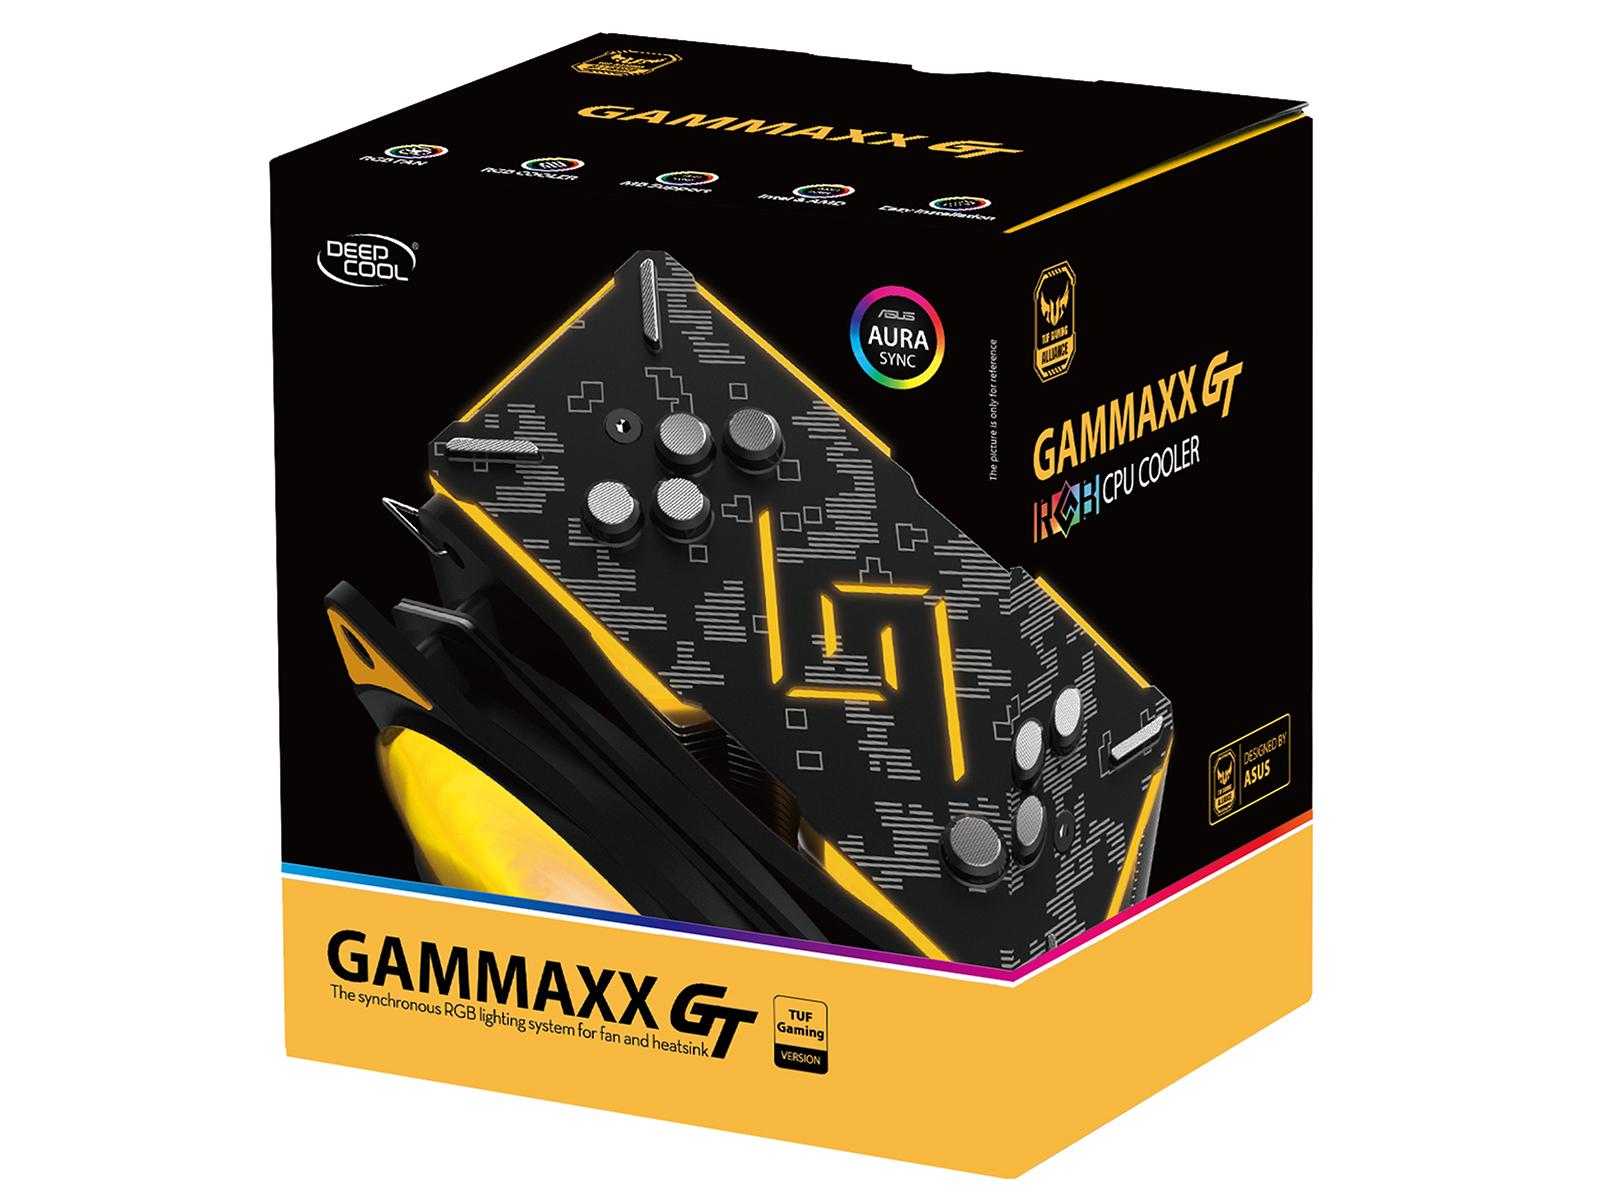 Deepcool Launches New RGB CPU Air Cooler, GAMMAXX GT TGA